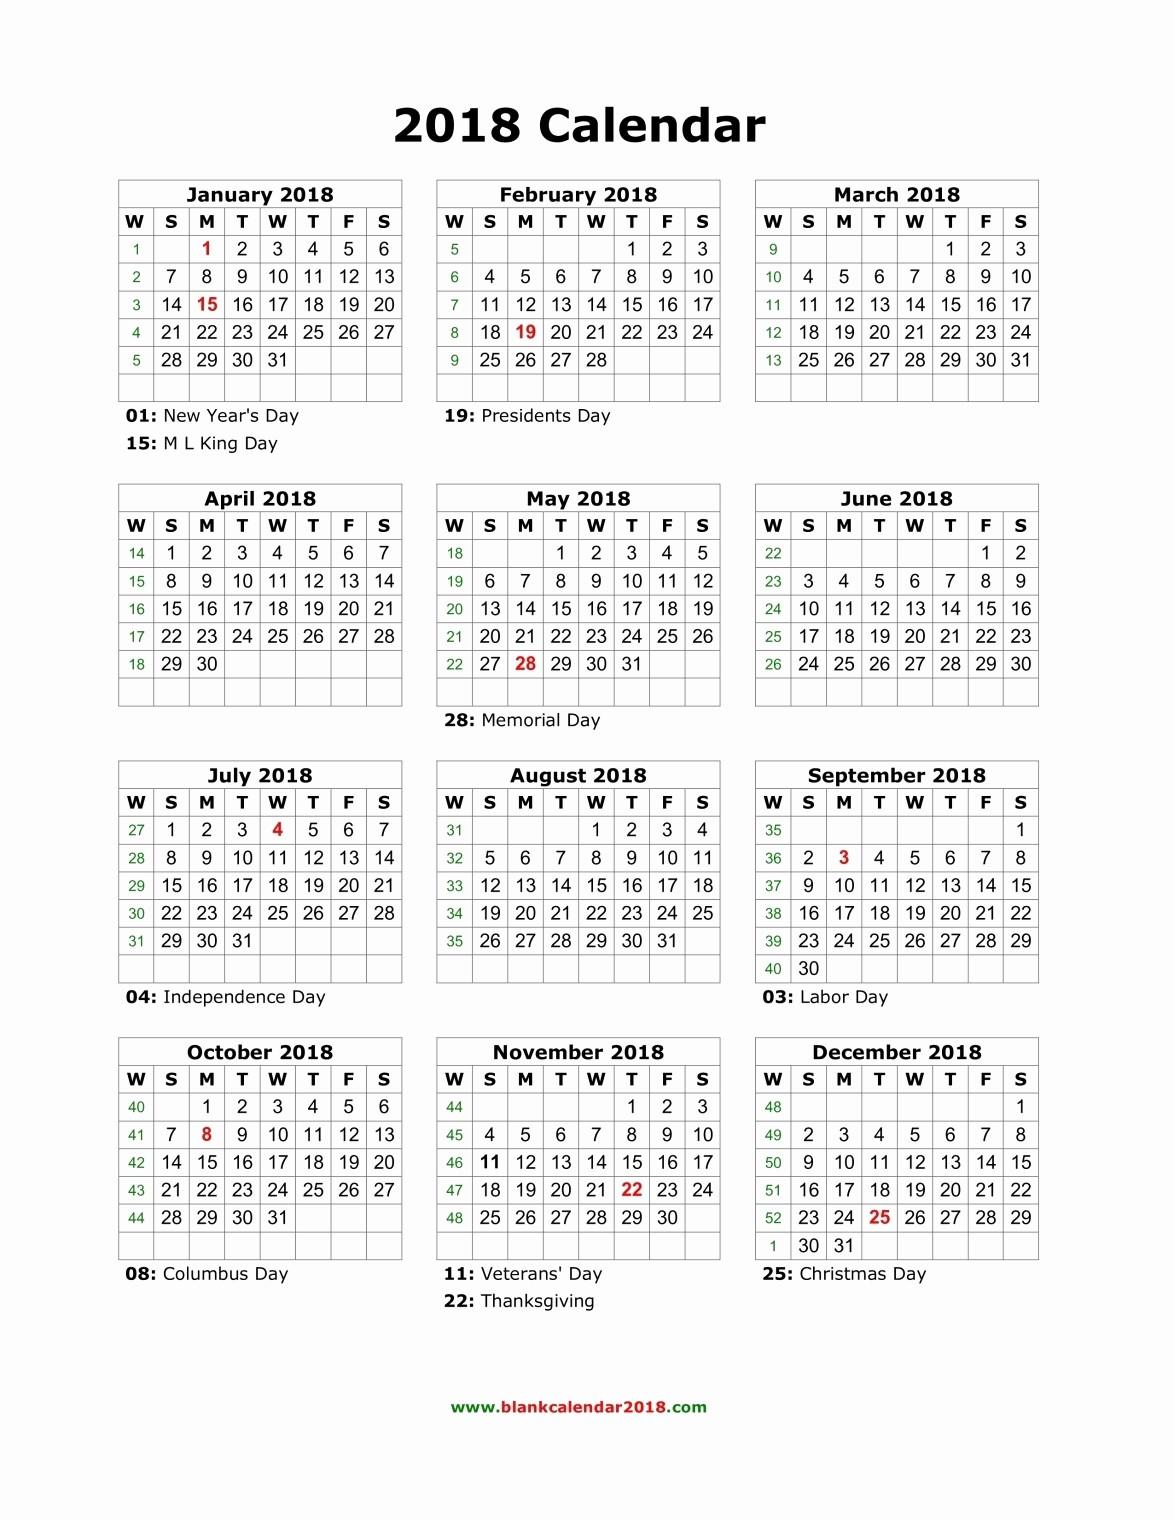 2018 Four Month Calendar Template Fresh 2018 Calendar Editable